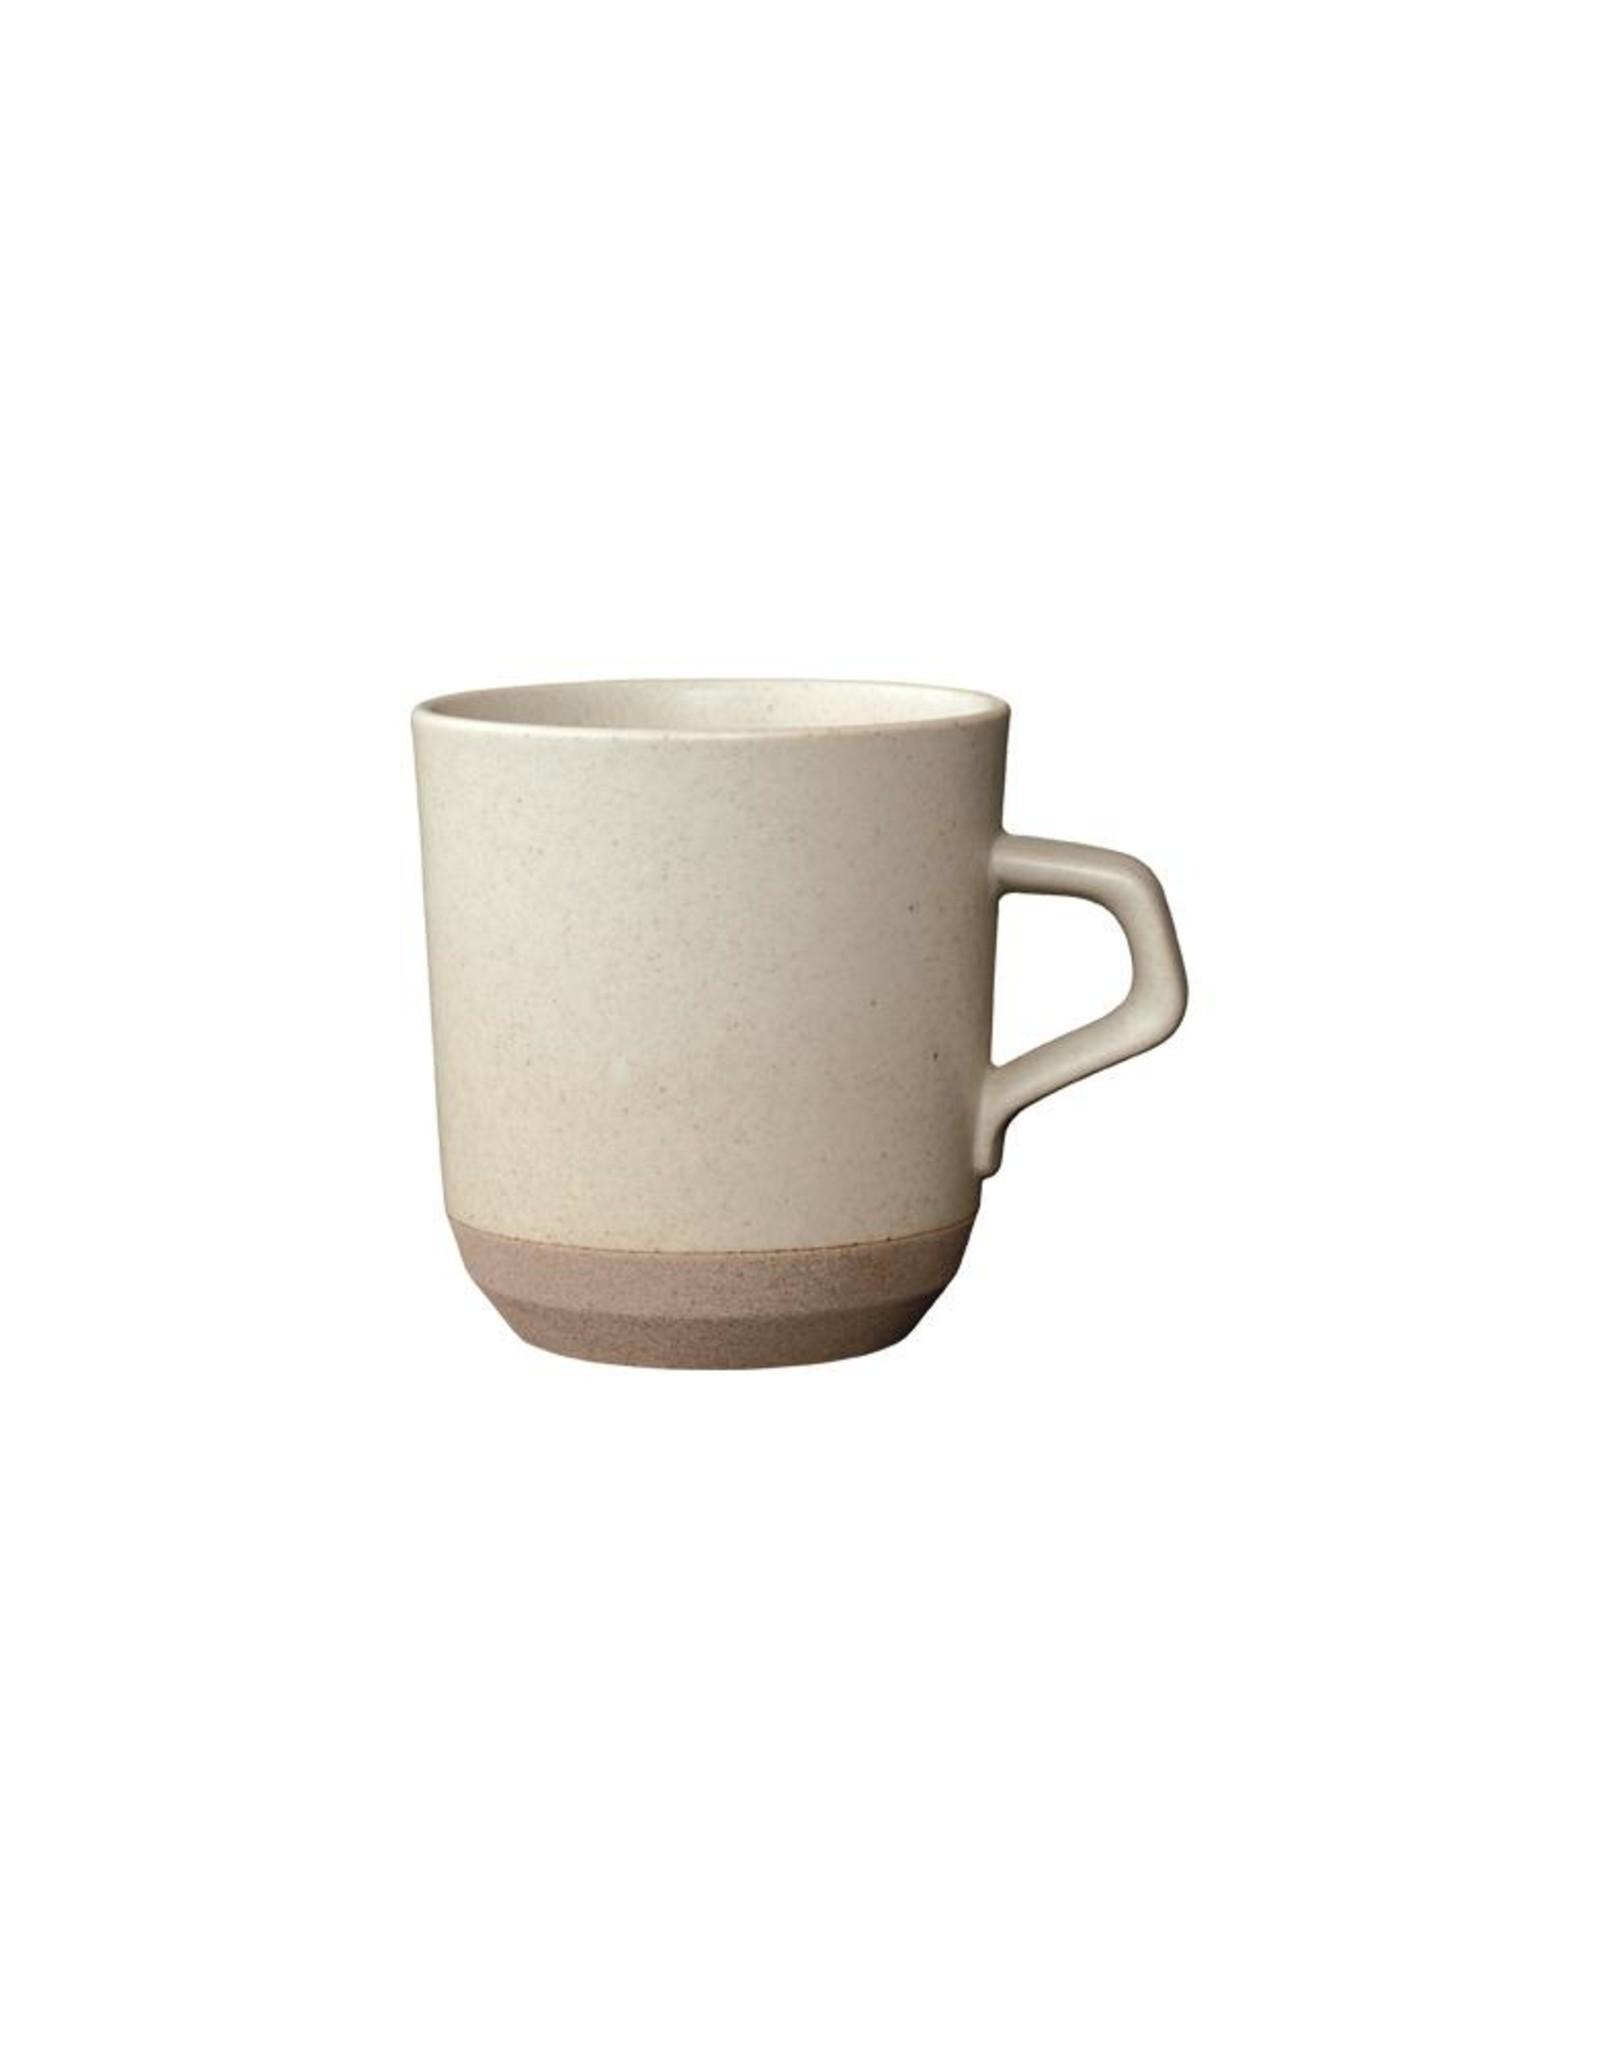 Kinto - Tasse en Céramique - 410 ml